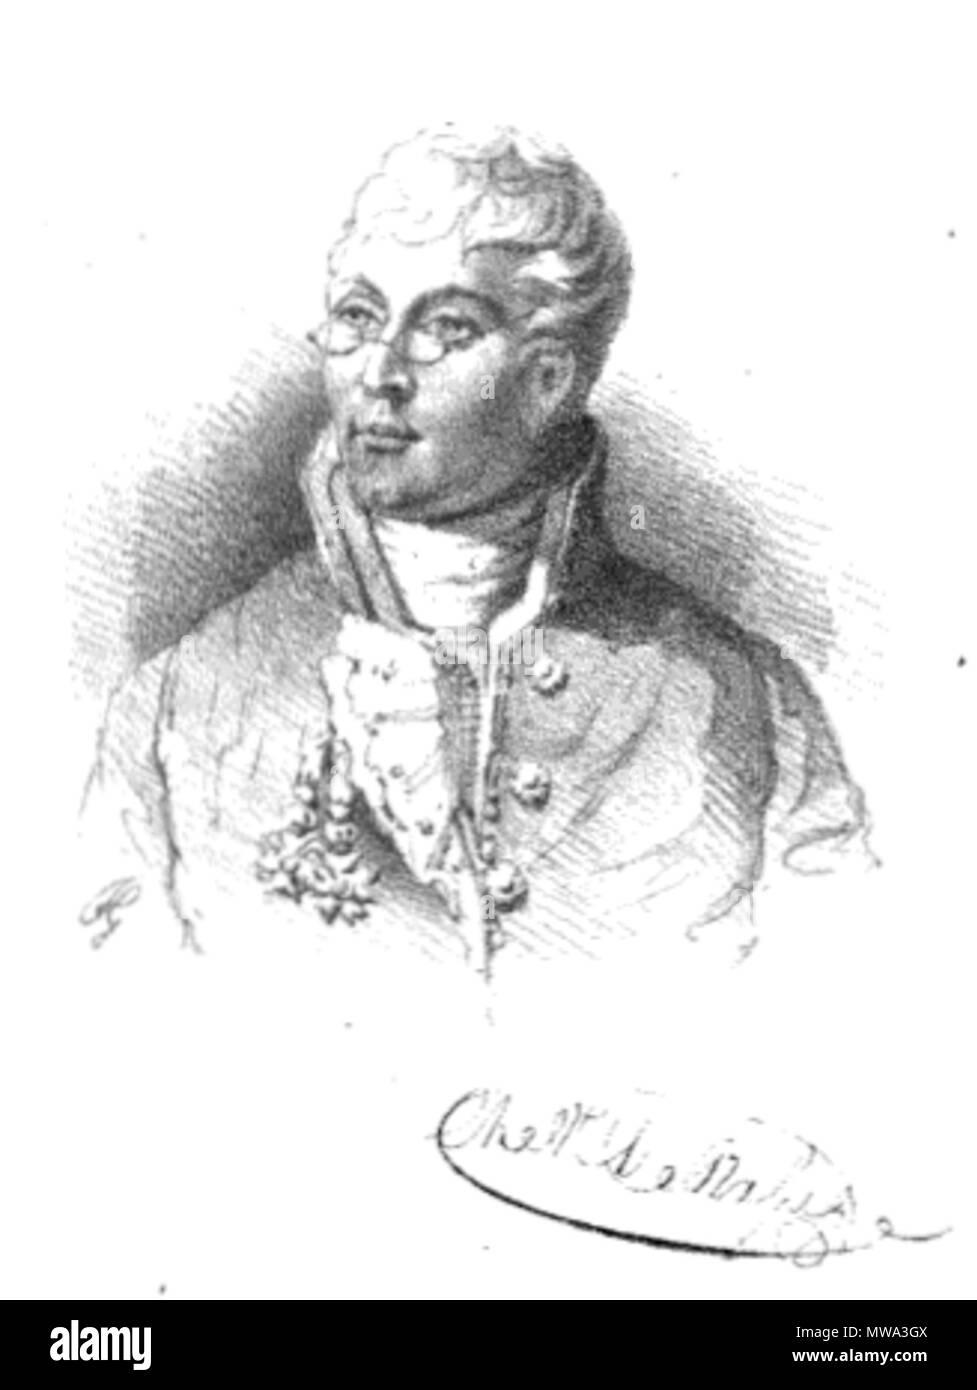 . English: Charles Henri Joseph de Rasse (1774-1818) . 19th century. Unknown 124 Charleshenriderasse - Stock Image